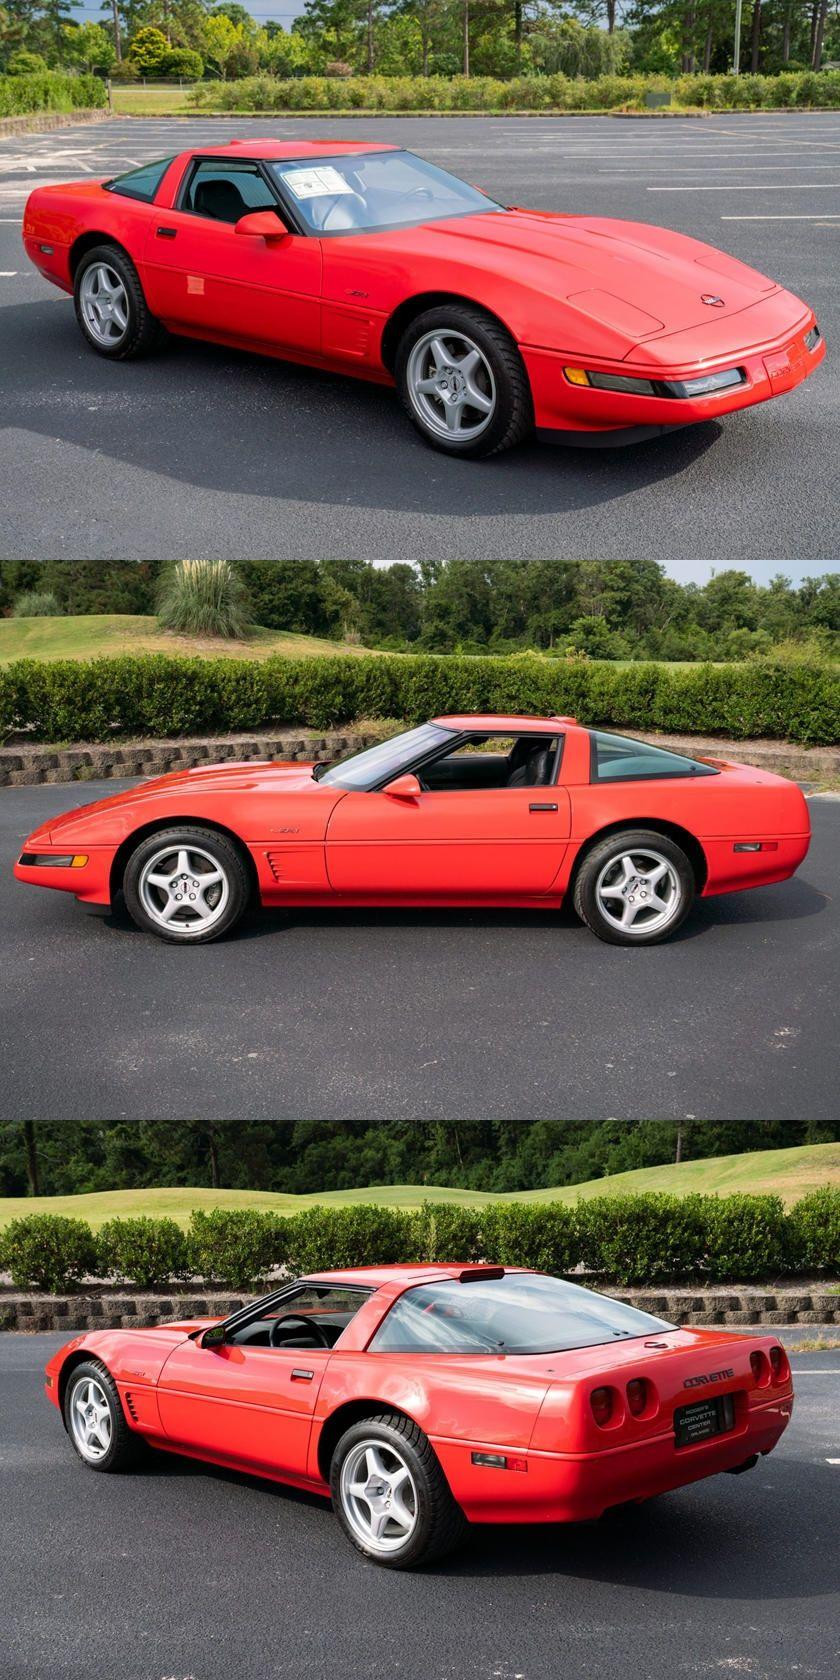 This 1995 Corvette Zr 1 Has Shockingly Low Mileage It S Also A Pretty Rare Find In 2020 Corvette Fastest Production Cars Mercury Marine